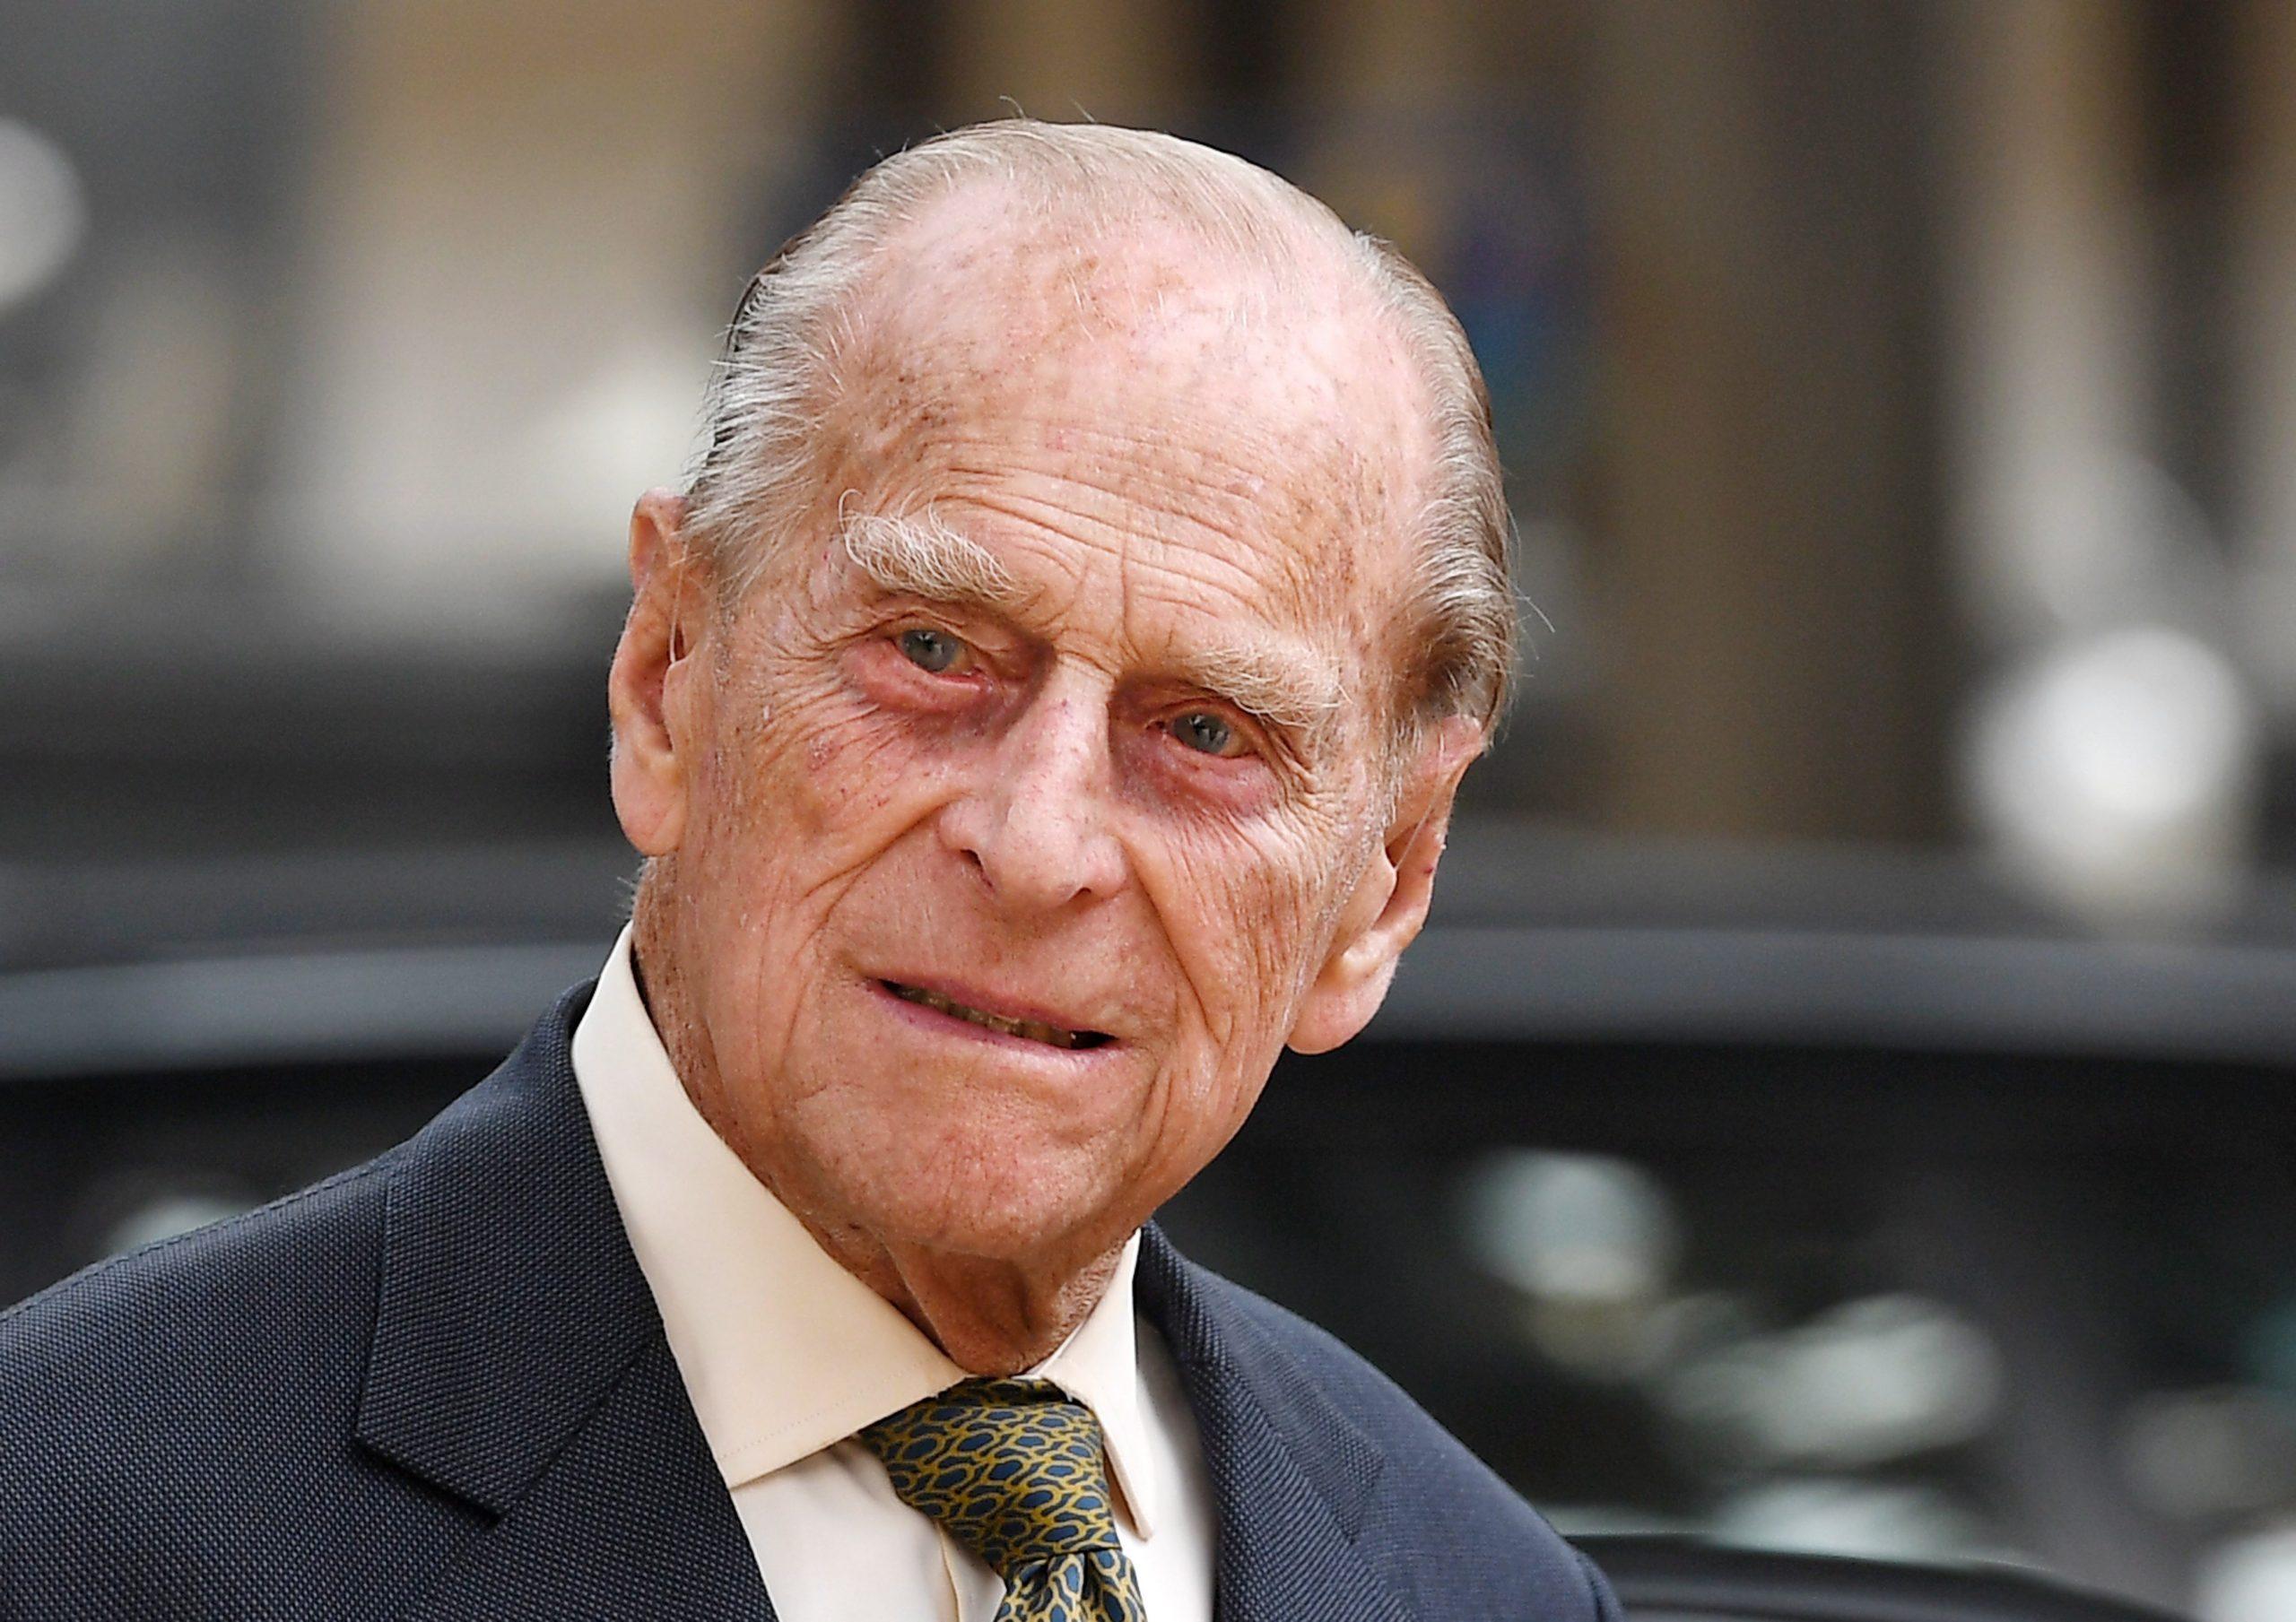 President Áder Sends Condolences to Elizabeth II Over Passing of Prince Philip